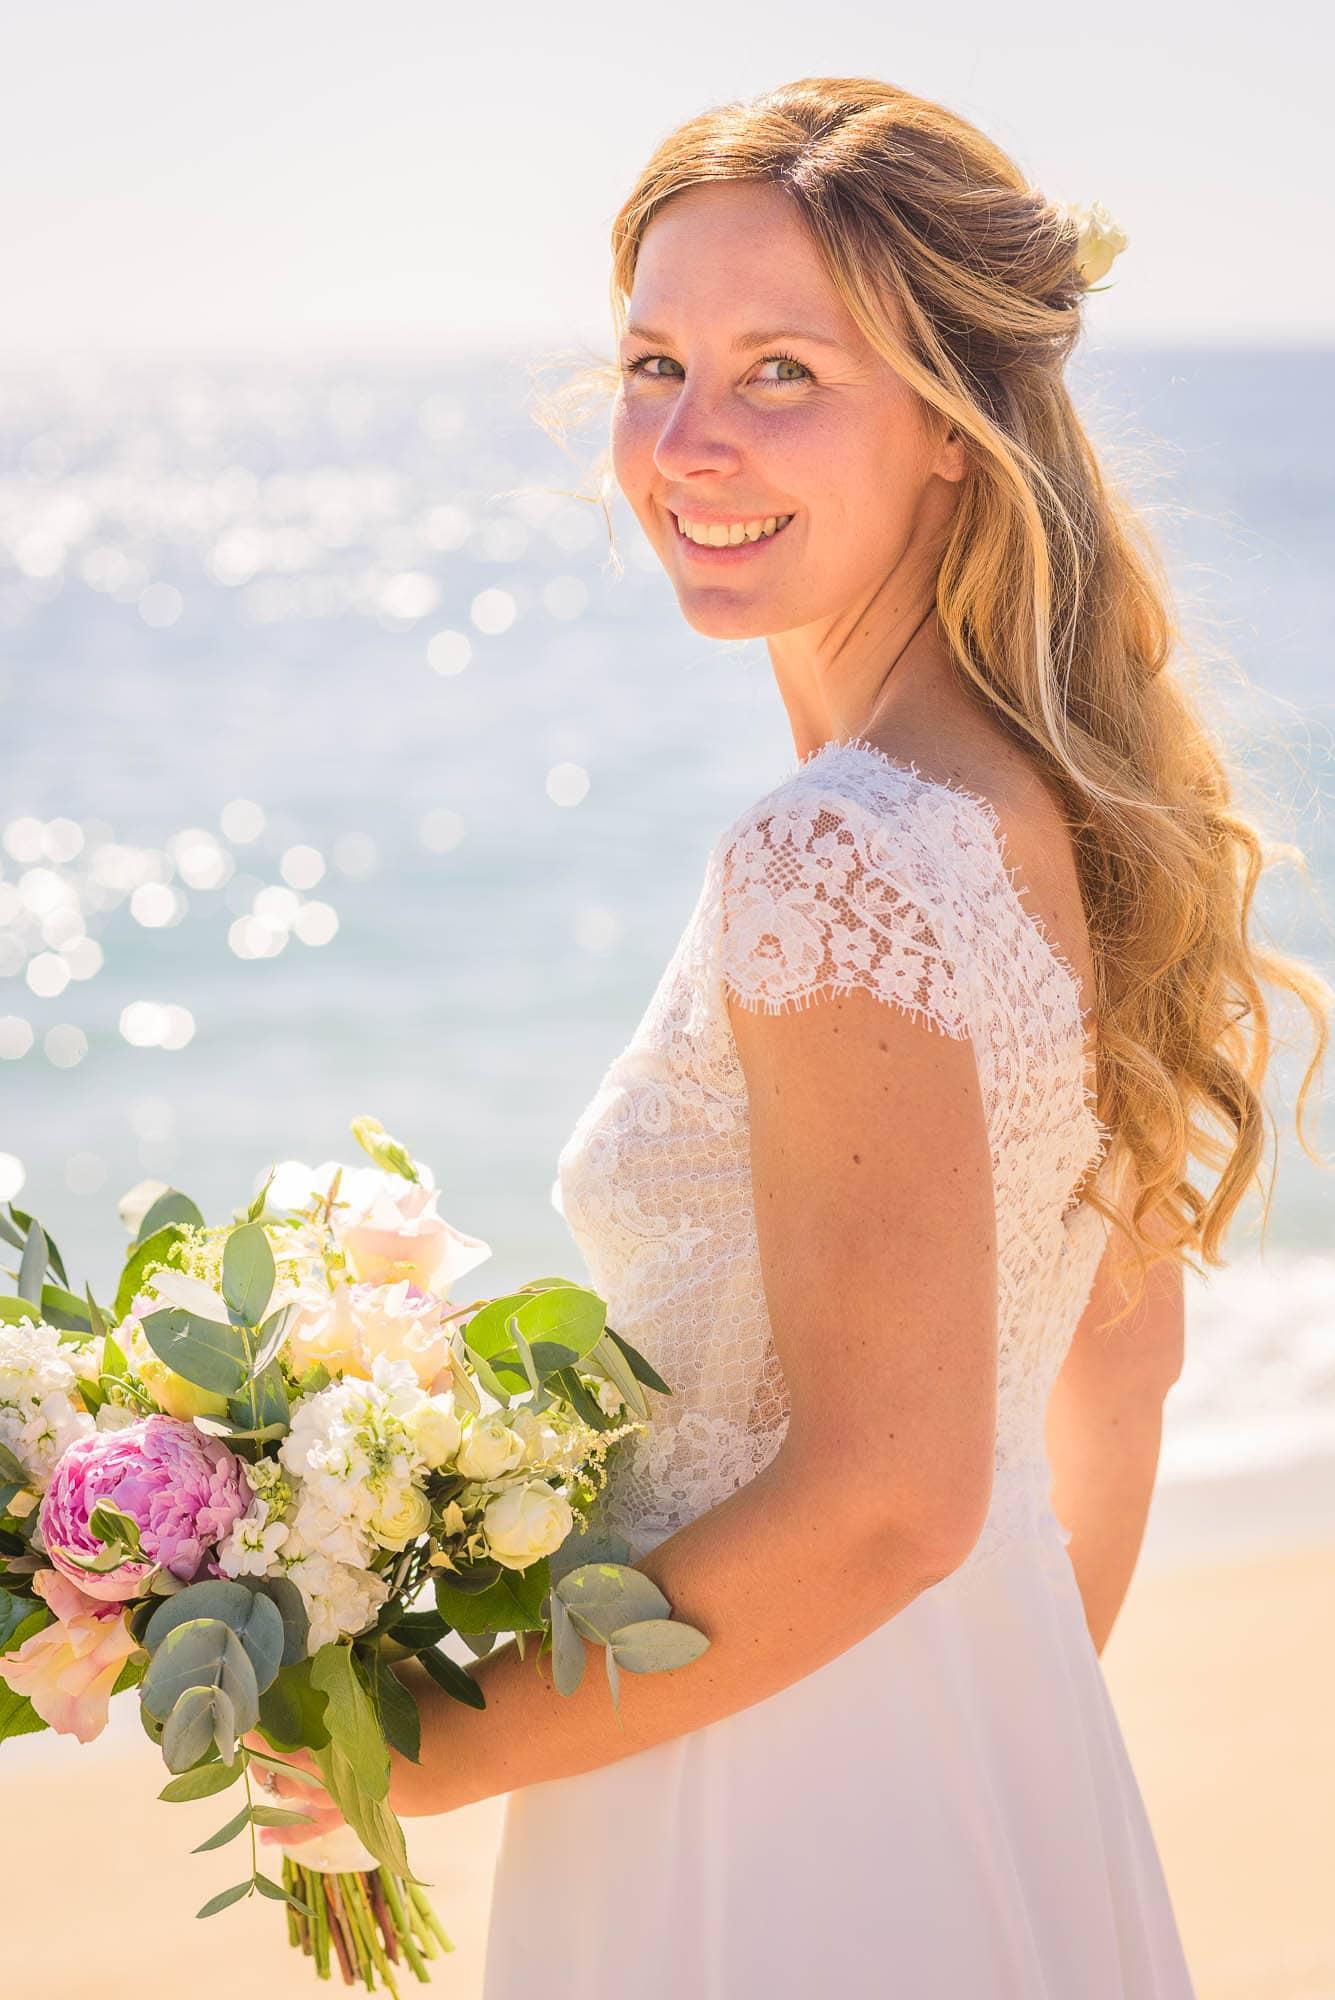 041_Alan_and_Heidi_Wedding_Verena_Andreas